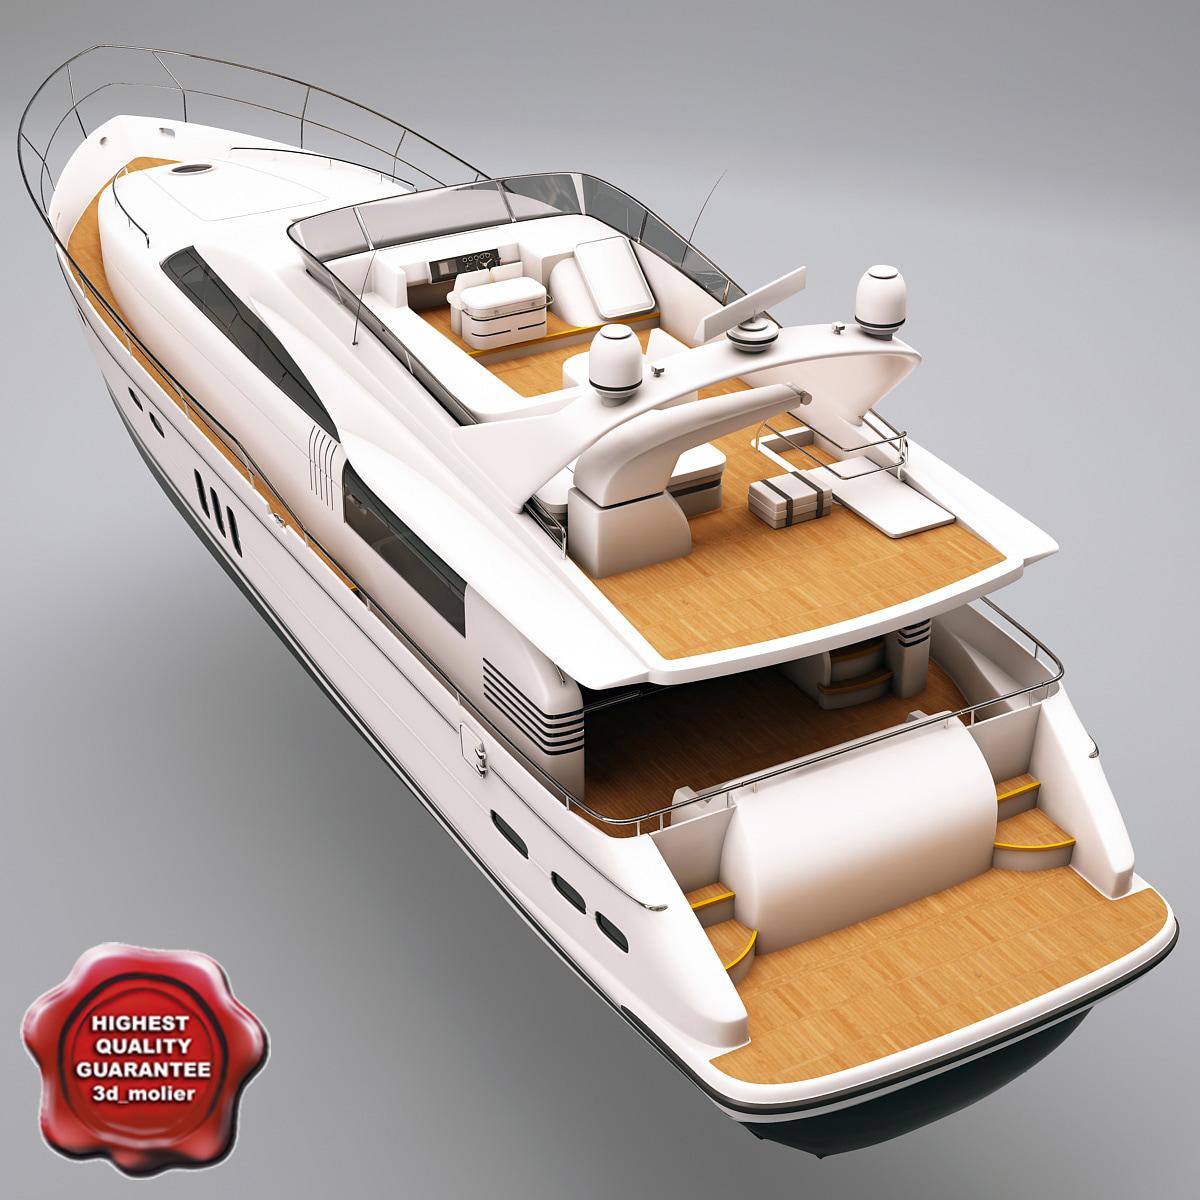 Yacht_Princess_23m_00.jpg